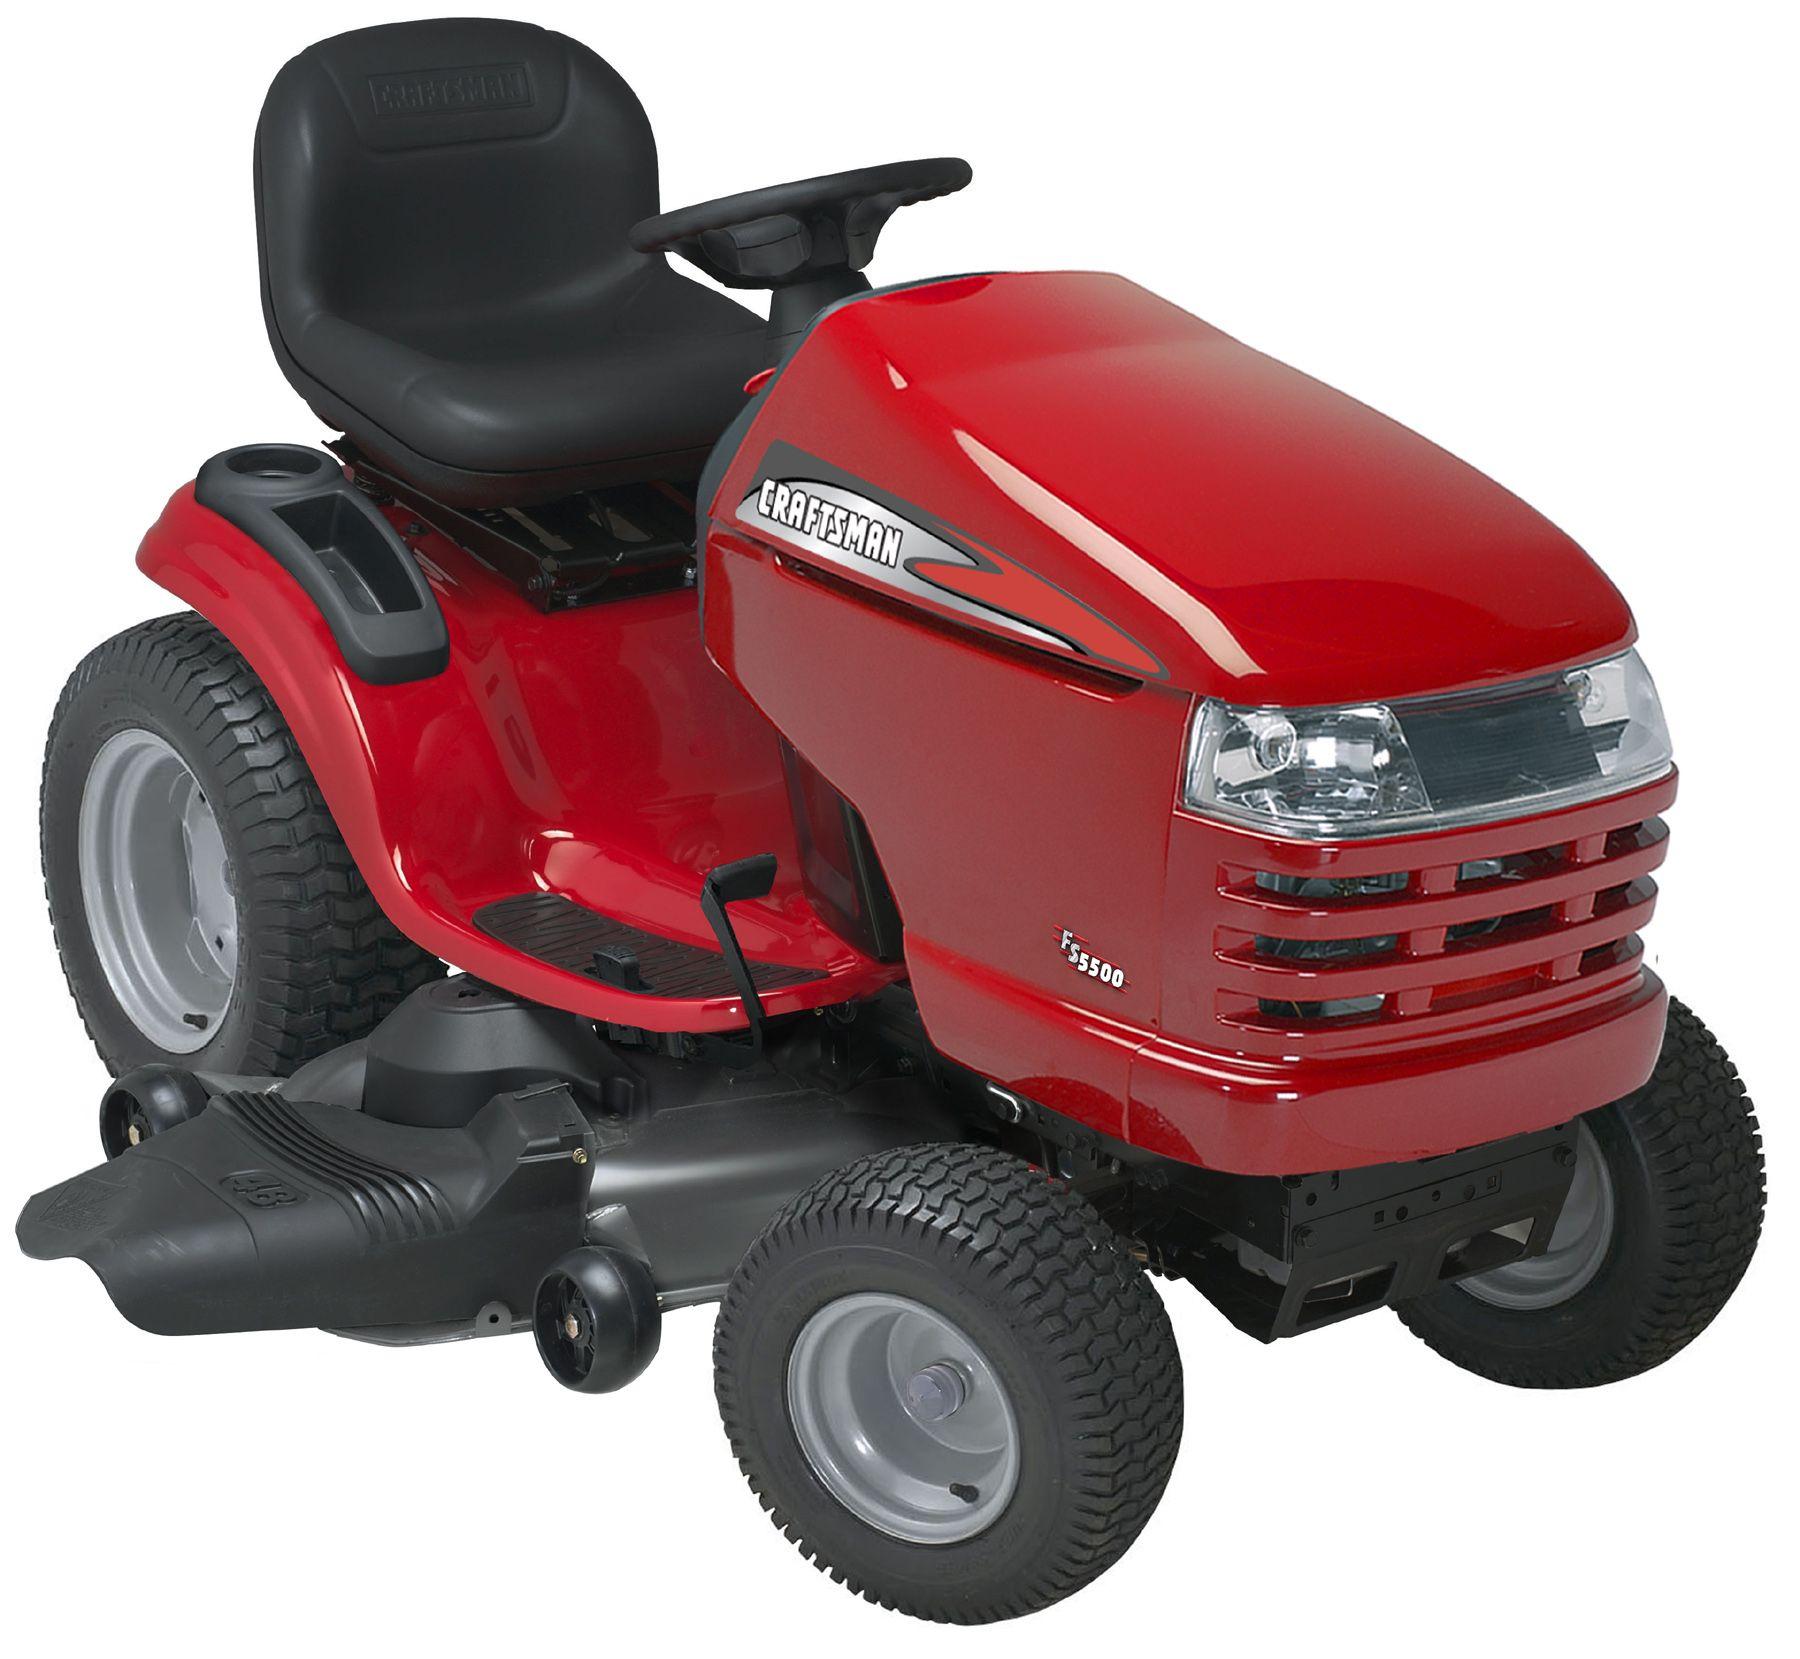 spin prod 210956701 wid 200 hei 250 craftsman tractor parts model 917276843 sears partsdirect at cita craftsman riding mower model 917 manual  [ 1800 x 1659 Pixel ]